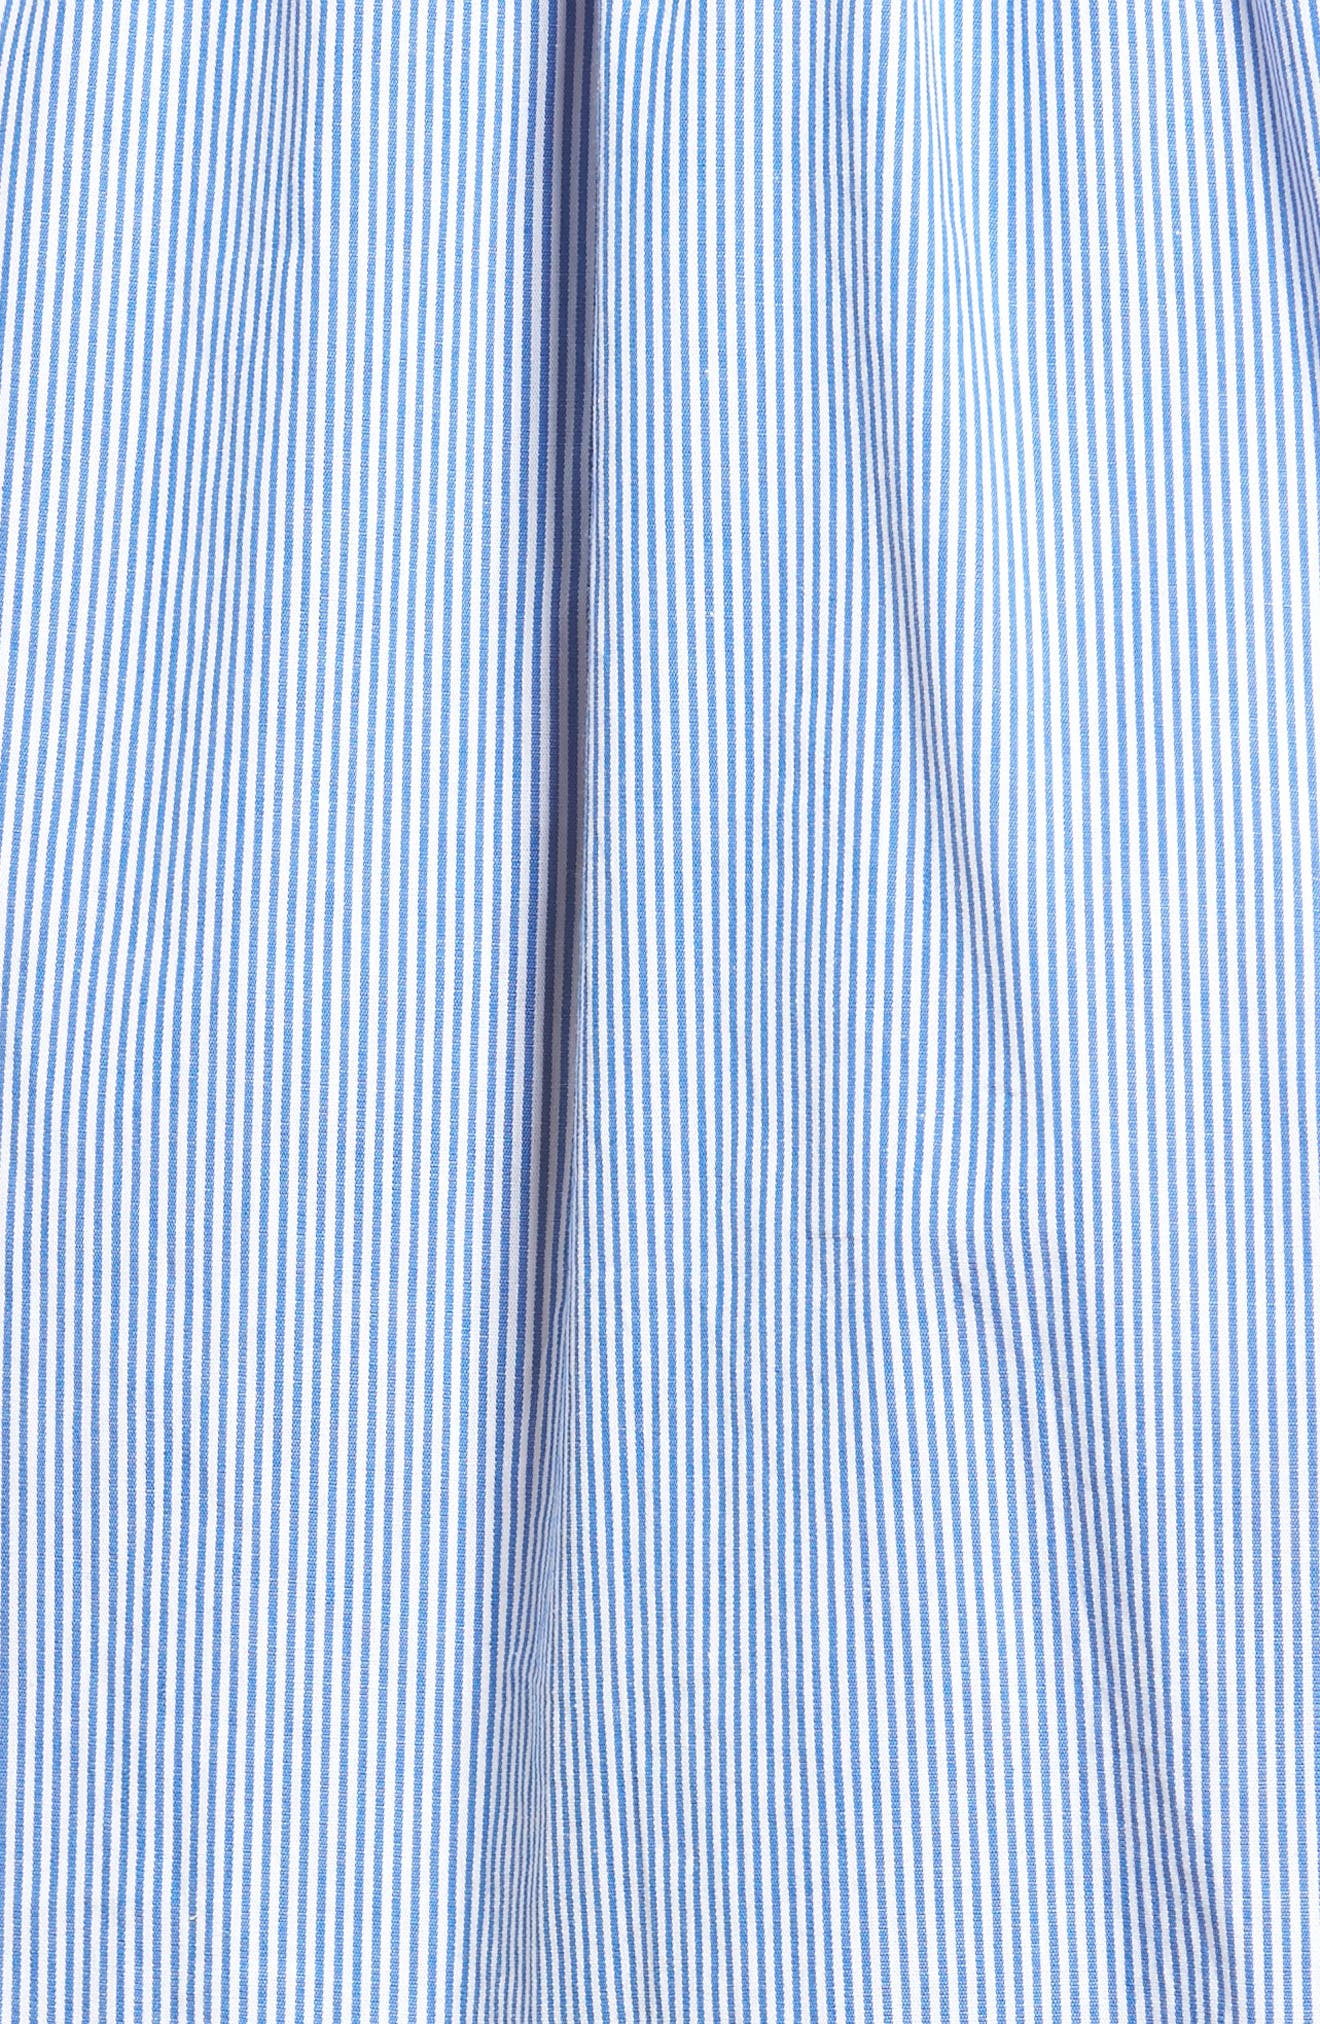 Stripe Wrap Dress,                             Alternate thumbnail 5, color,                             400